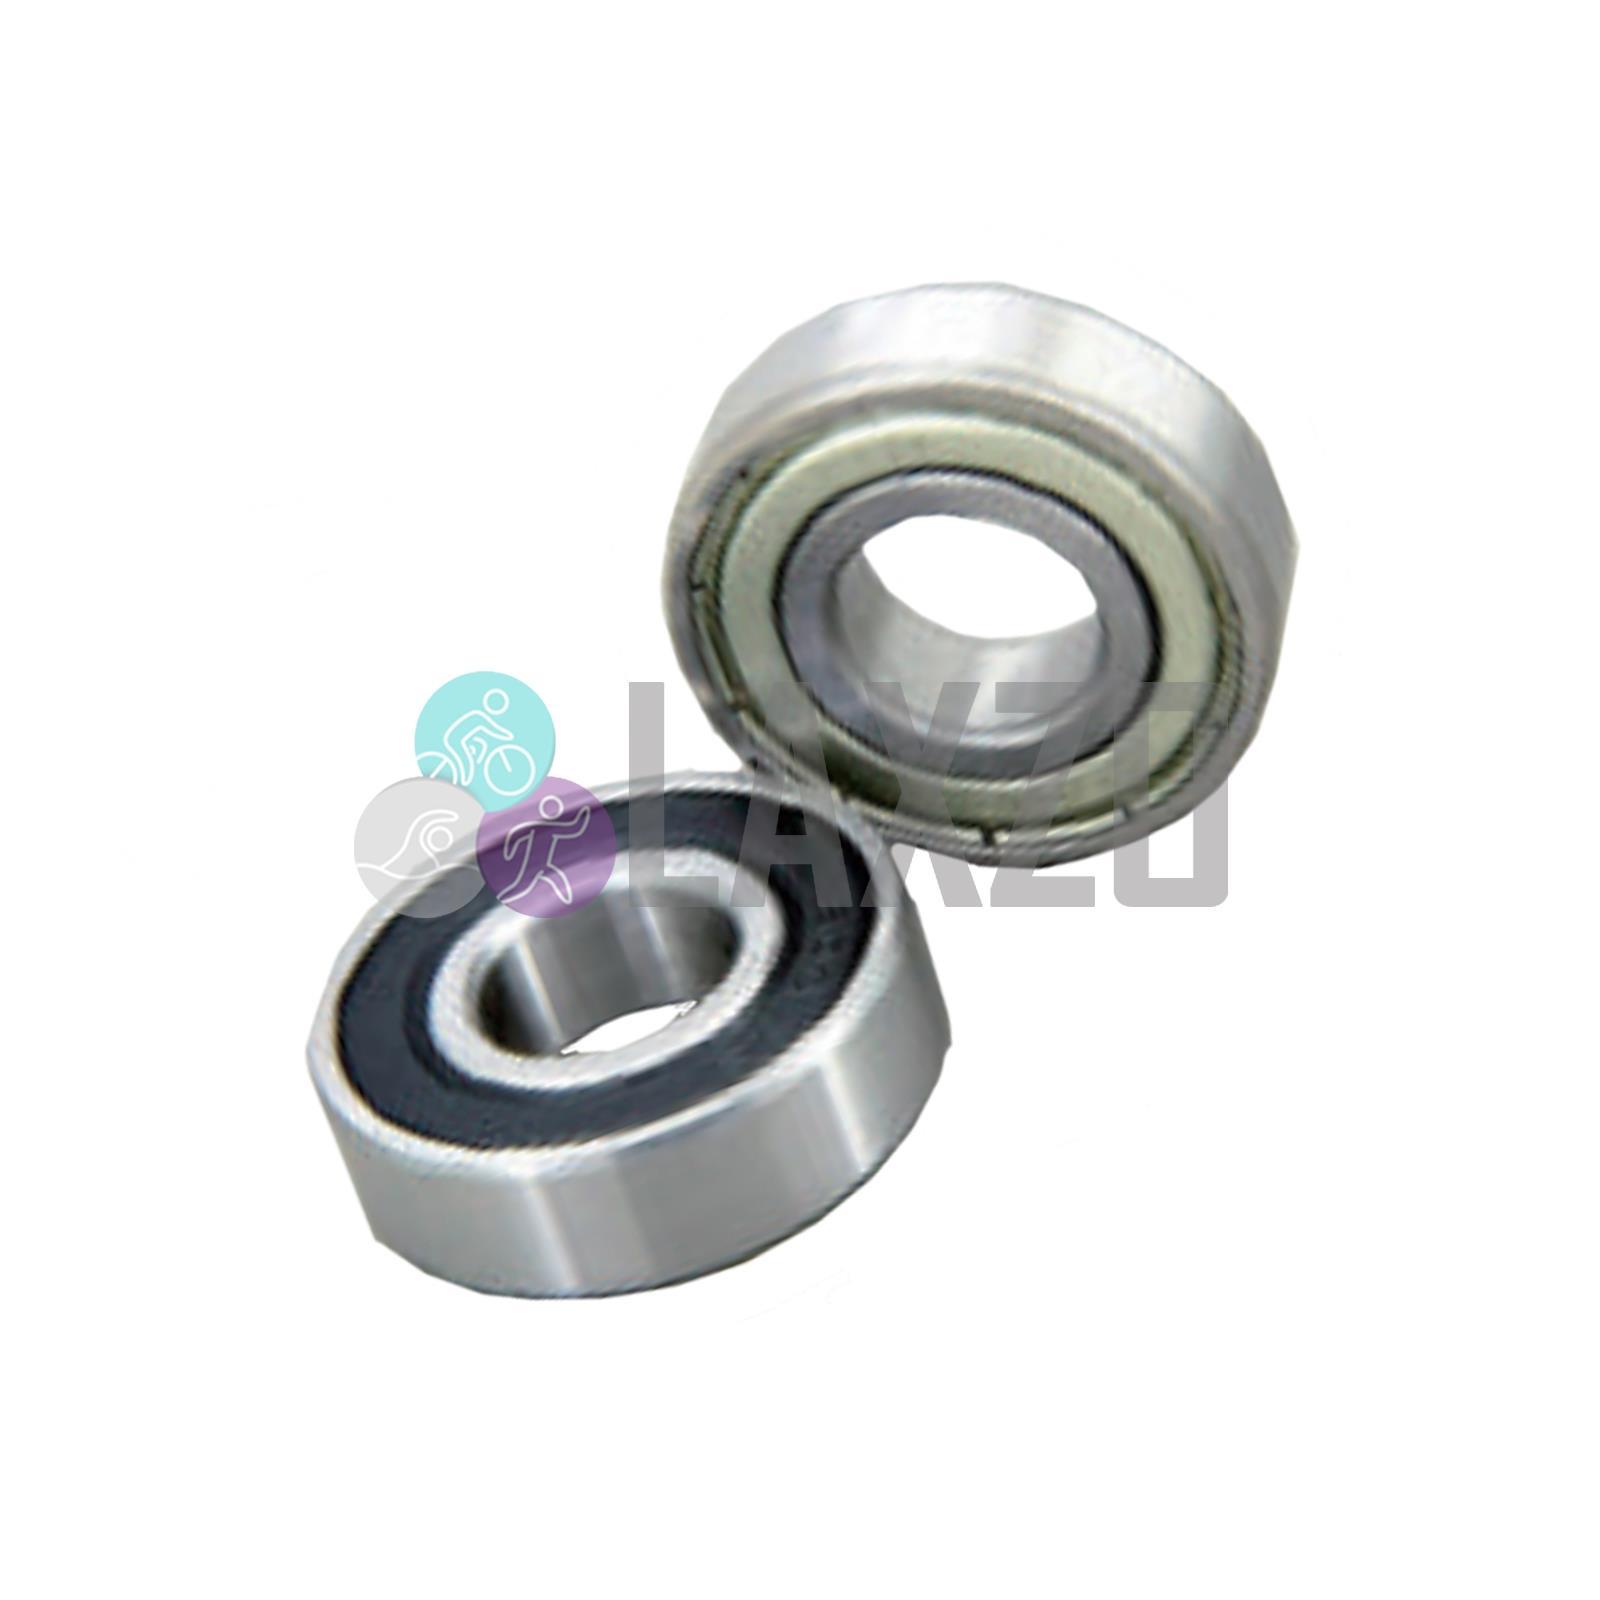 Ceramic Bicycle Cycle Wheel Hub Bearings Cema Bearing #6903 17 x 30 x 7mm